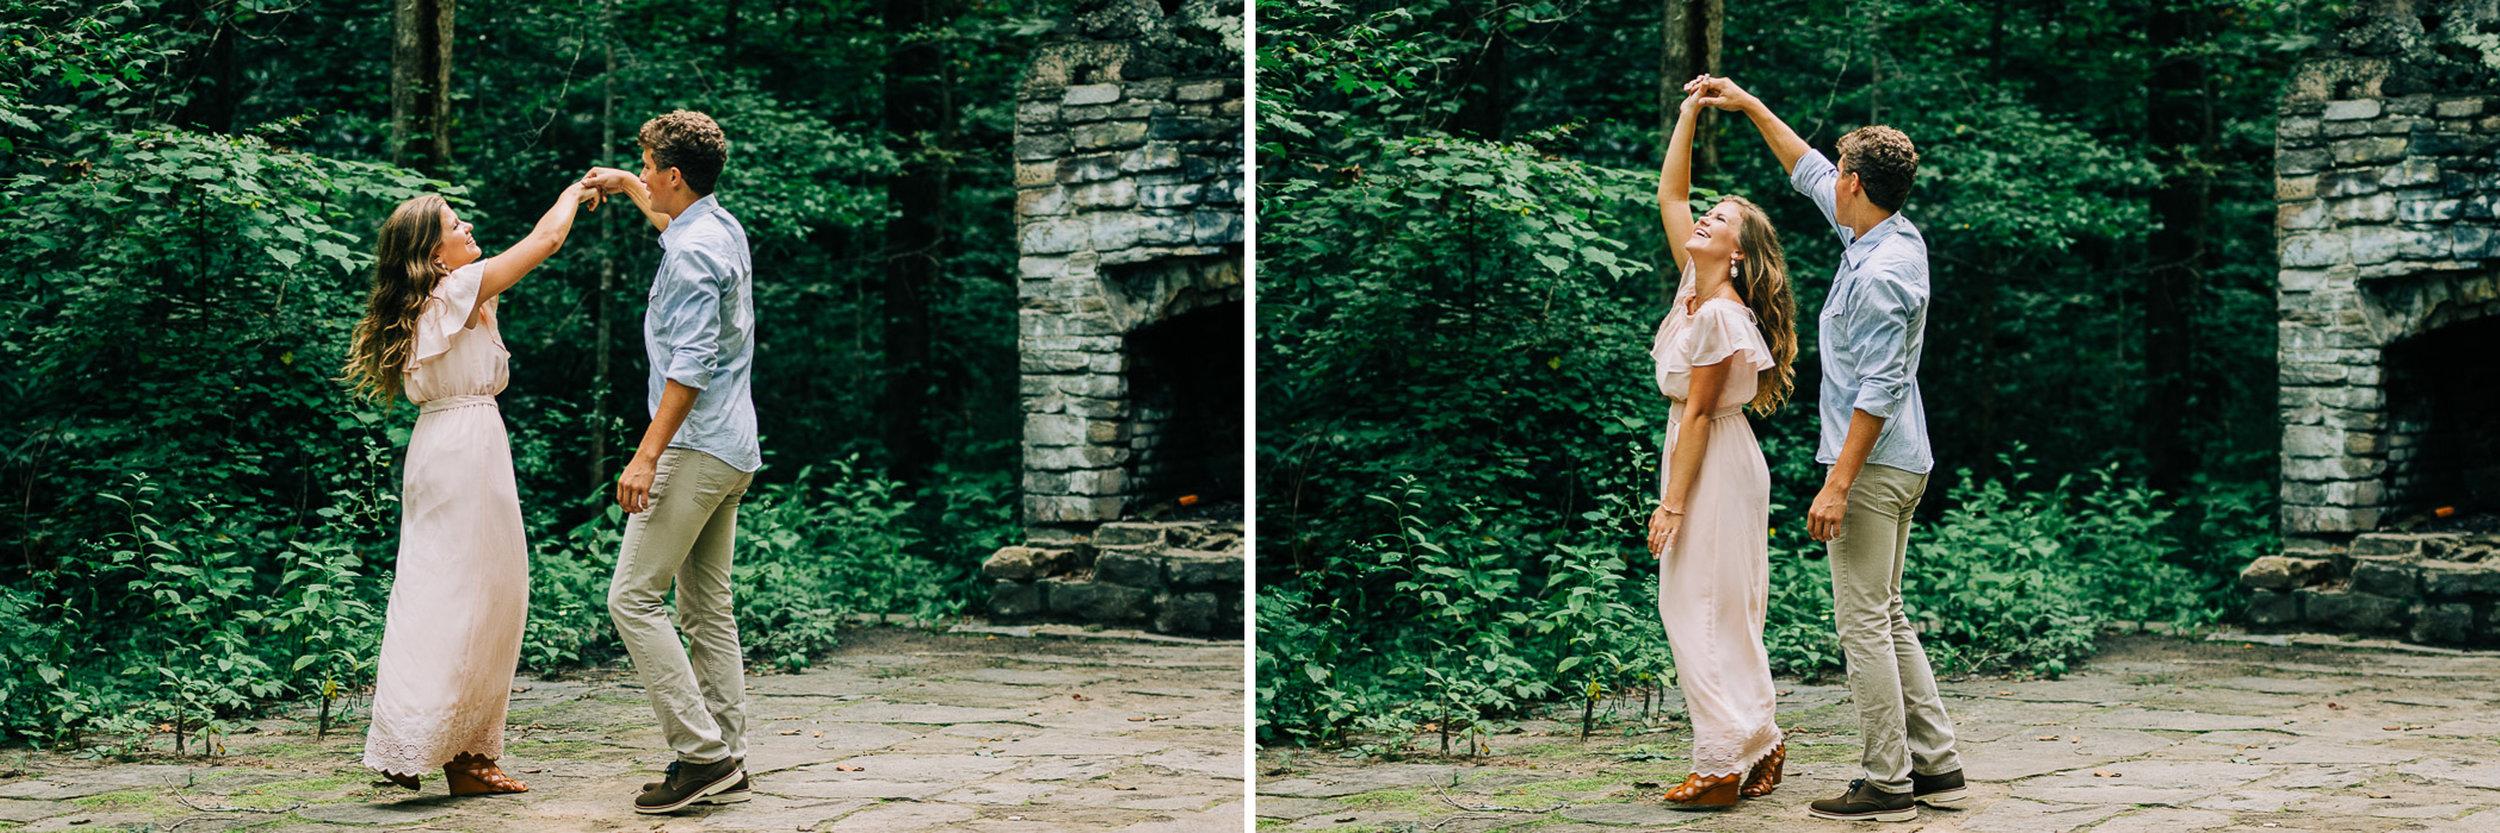 Engagement Portraits, Summer Engagement, Summer Mast Photography, 21.jpg